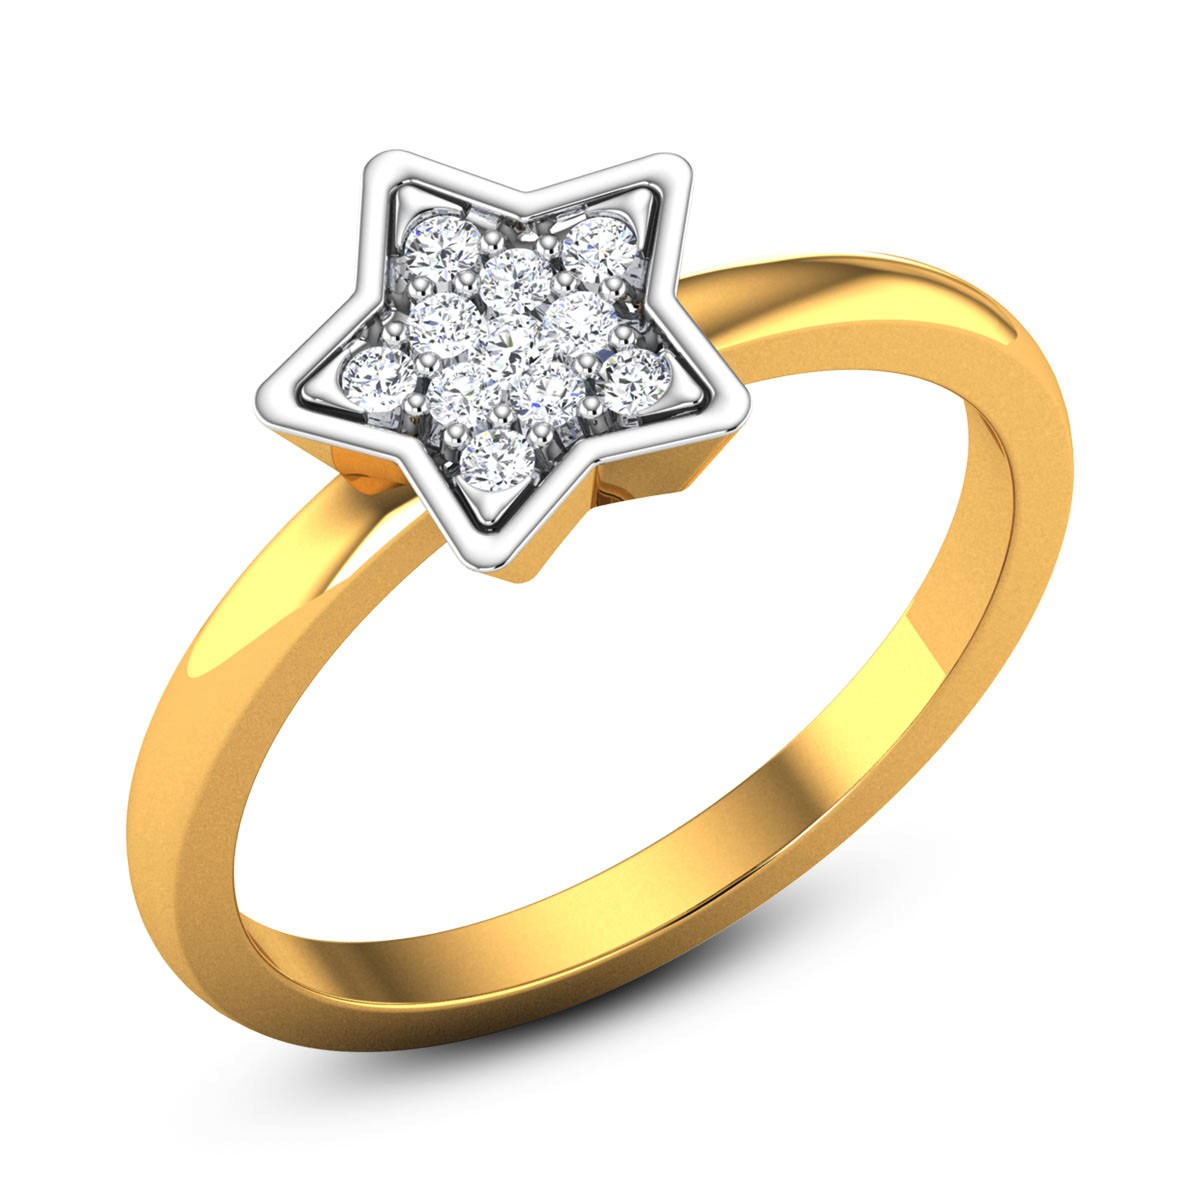 Pirro Star Diamond Ring